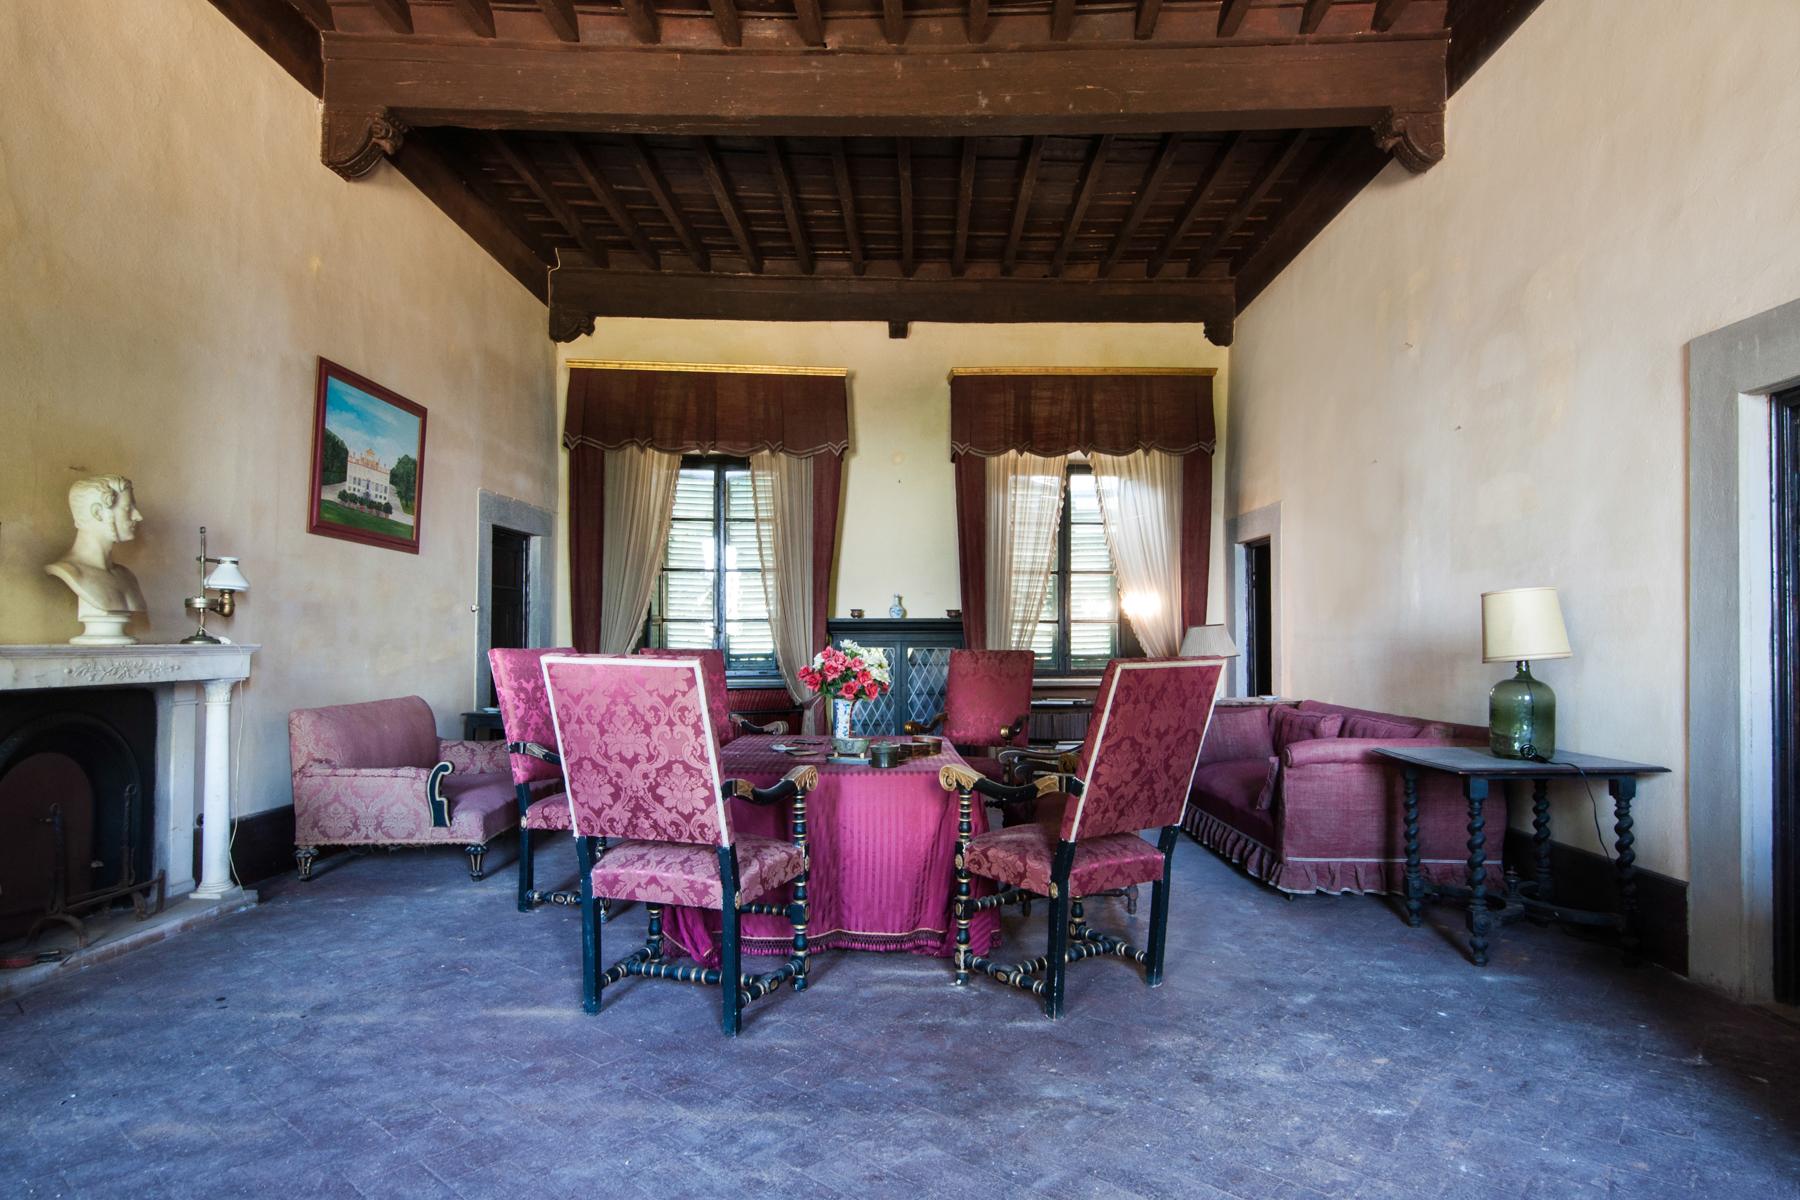 Additional photo for property listing at Splendid villa in Lucca countryside Via di Vicopelago Pozzuolo, Lucca 55100 Italy